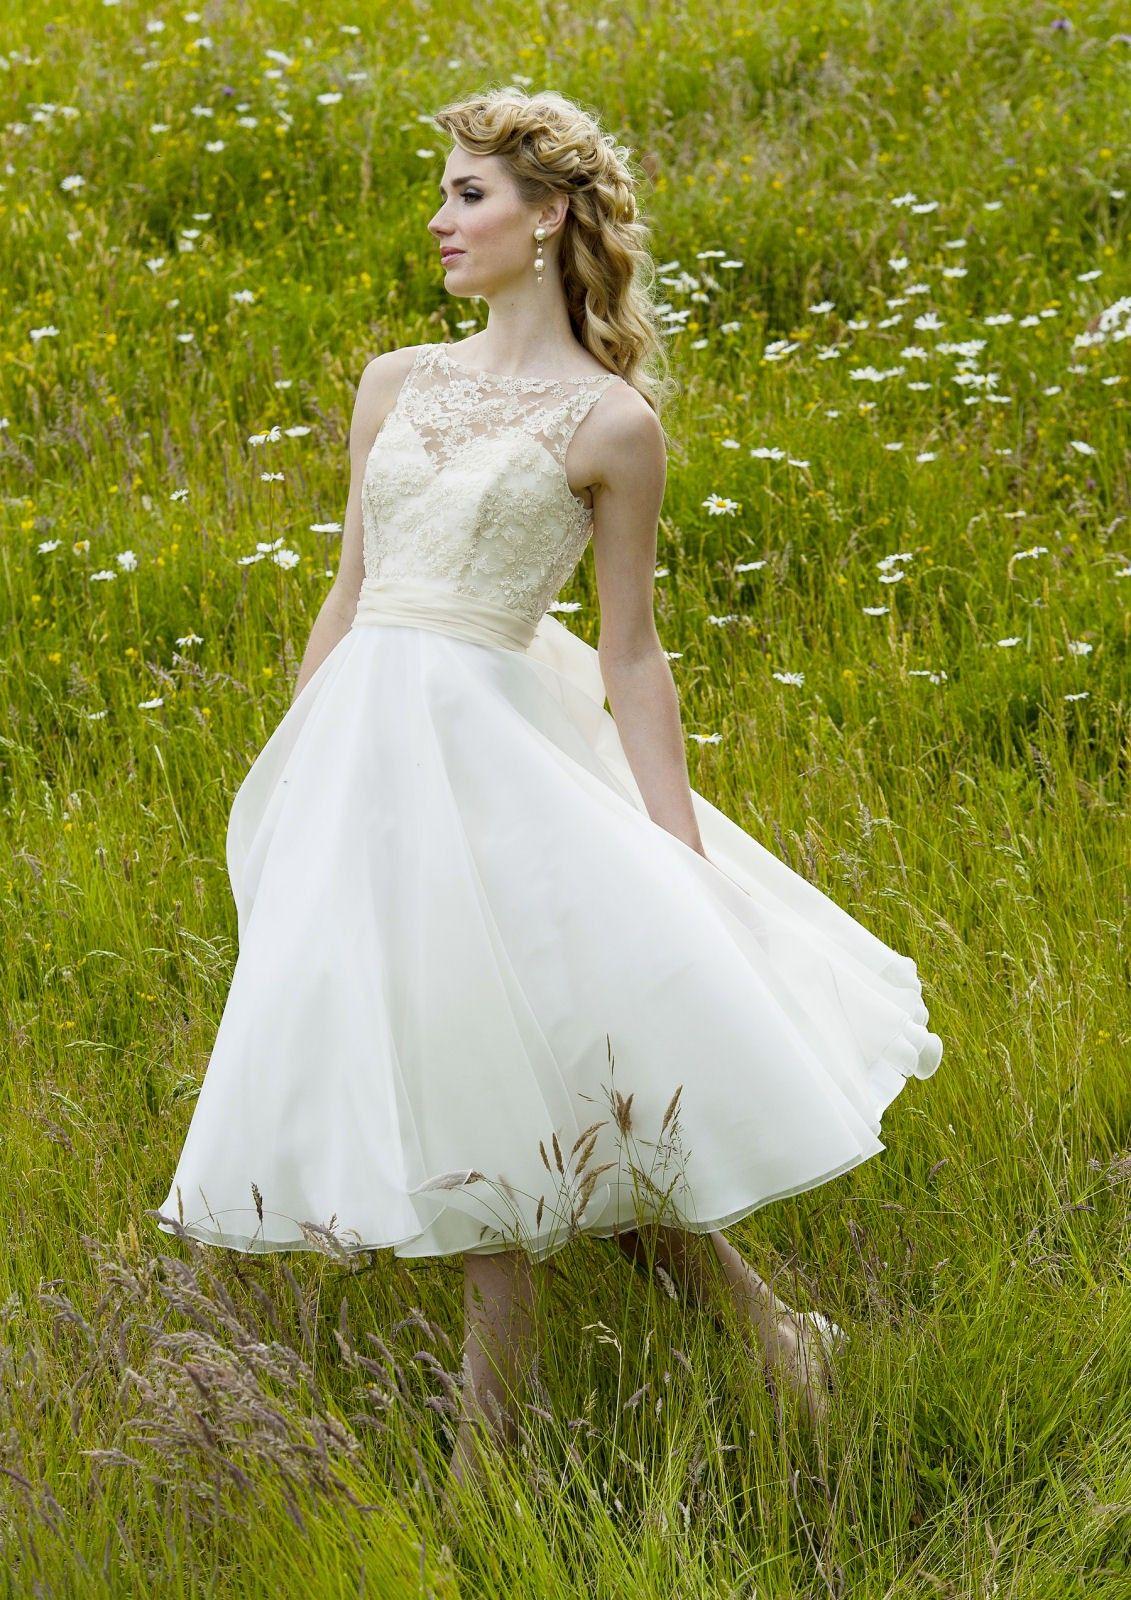 Vintage wedding tea dress  Vintage Ivory Tealength Organza Lace Wedding Party Dress